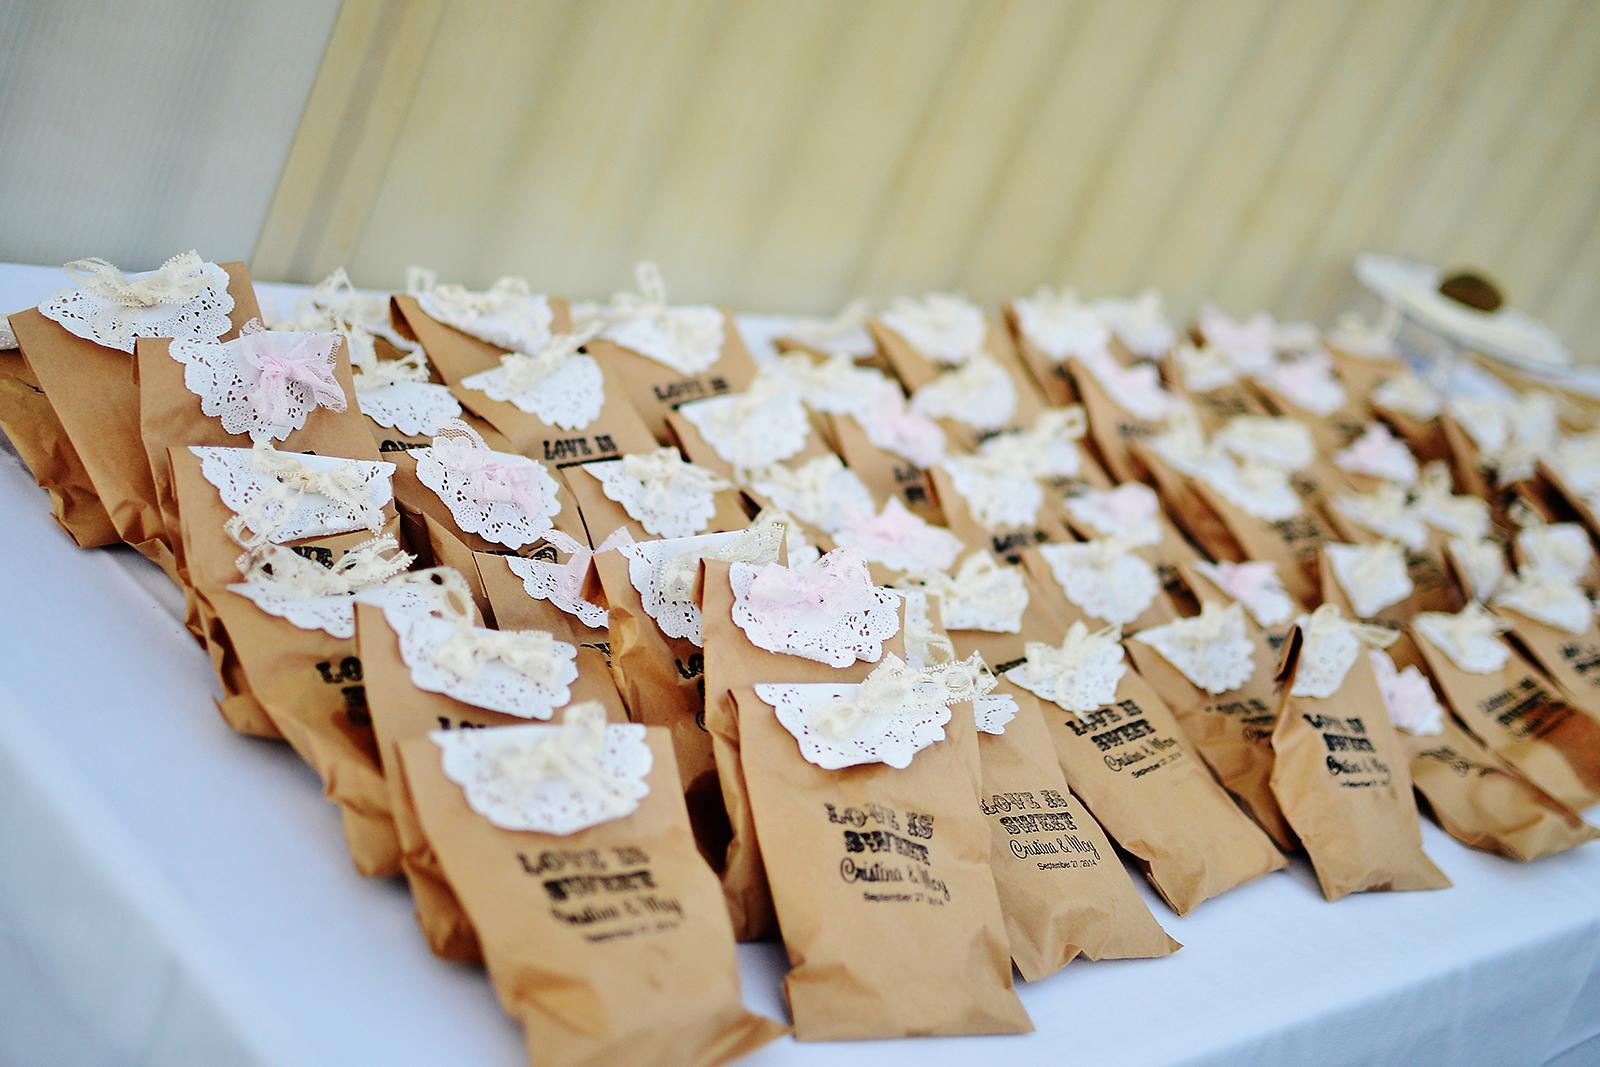 cake, wedding cake, stephy wong photography, wedding details, wedding cookies